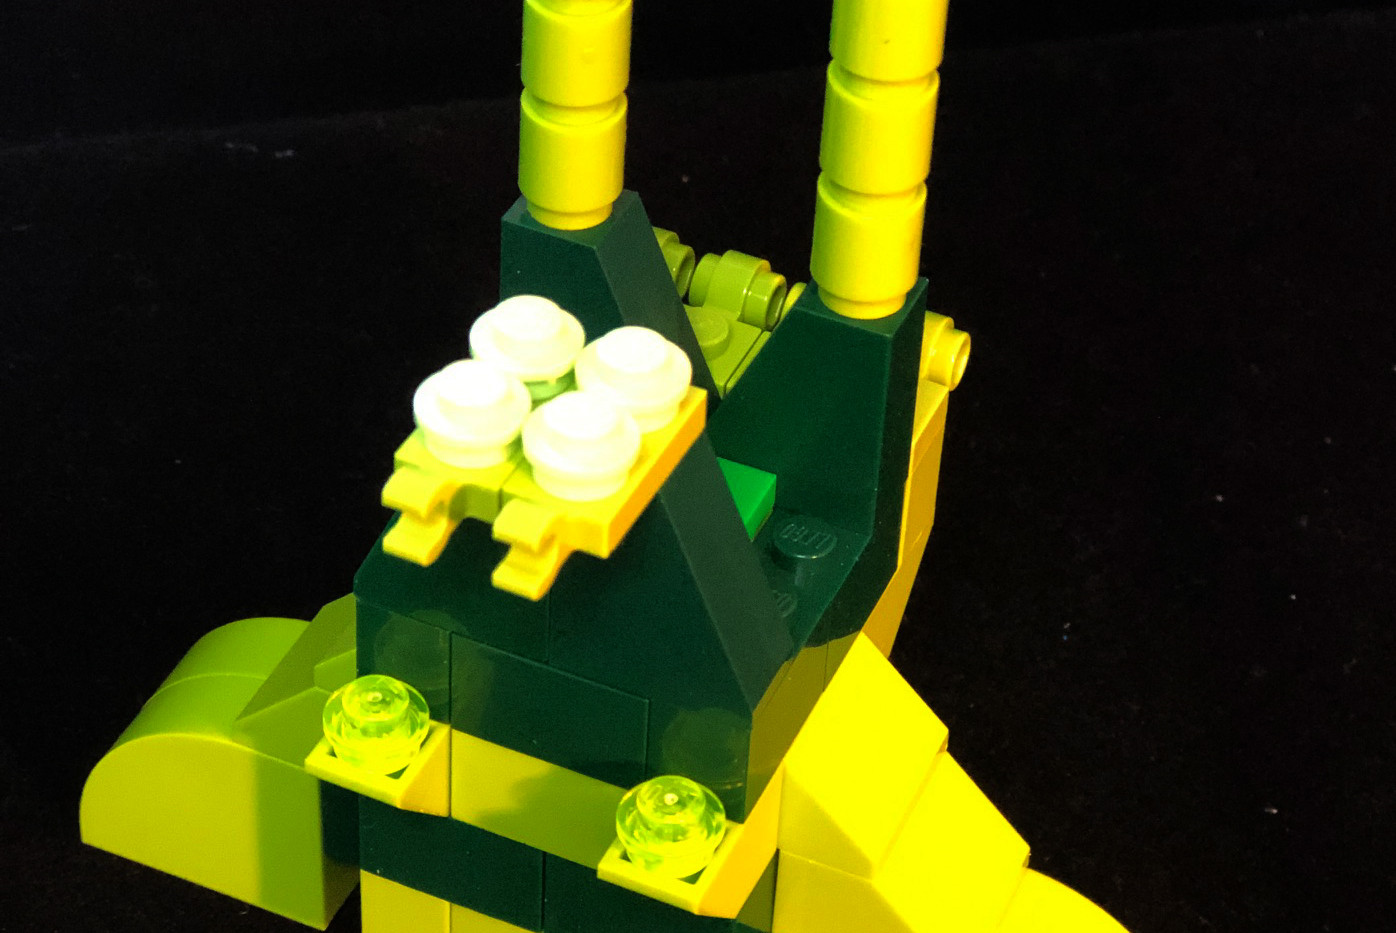 LEtitGO--Green Crab by Thomas Moraitis